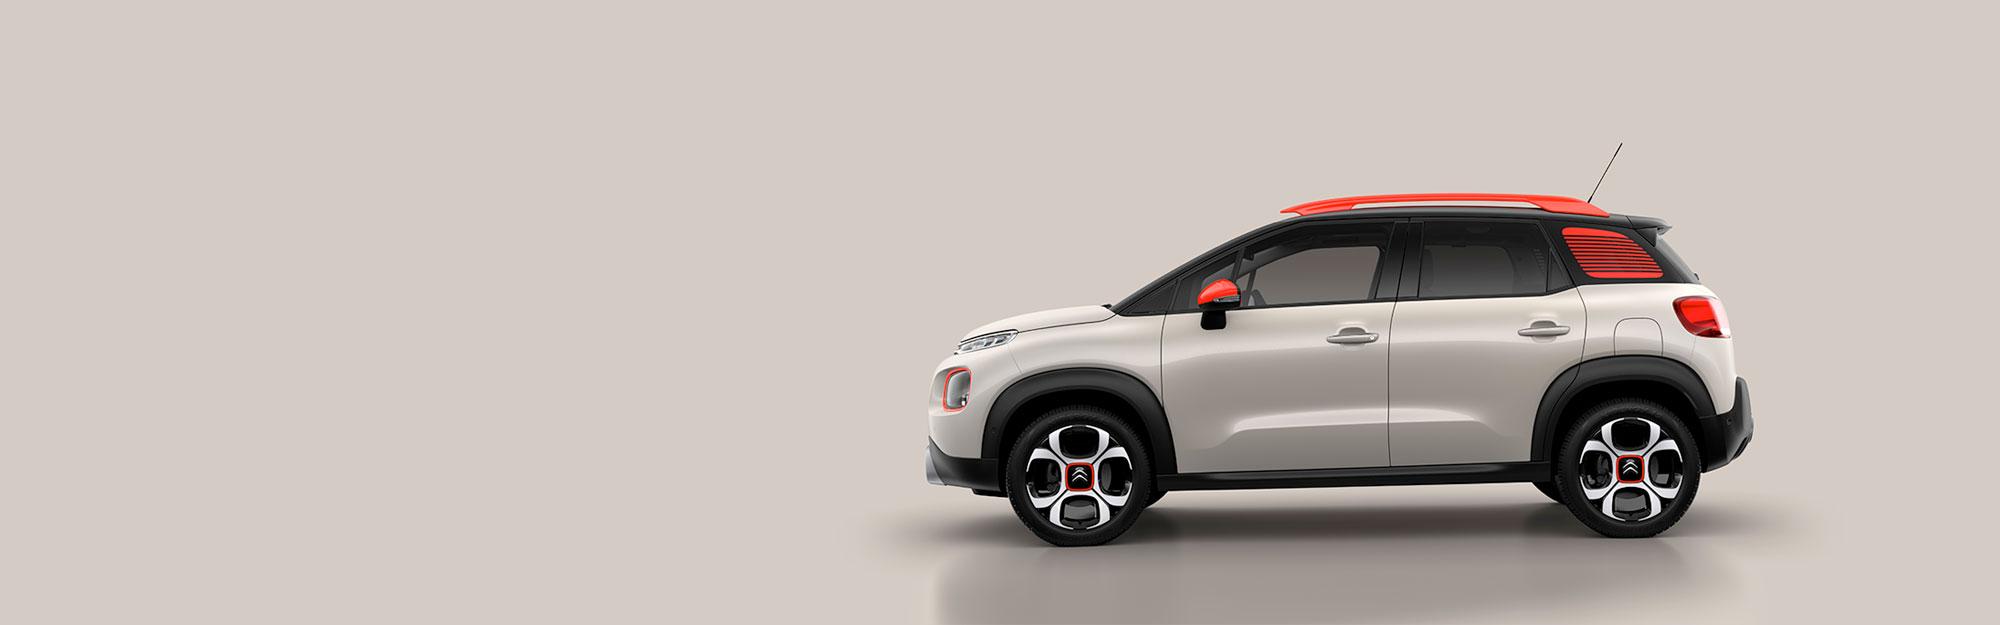 Novo Compact SUV, Citroën C3 AIRCROSS